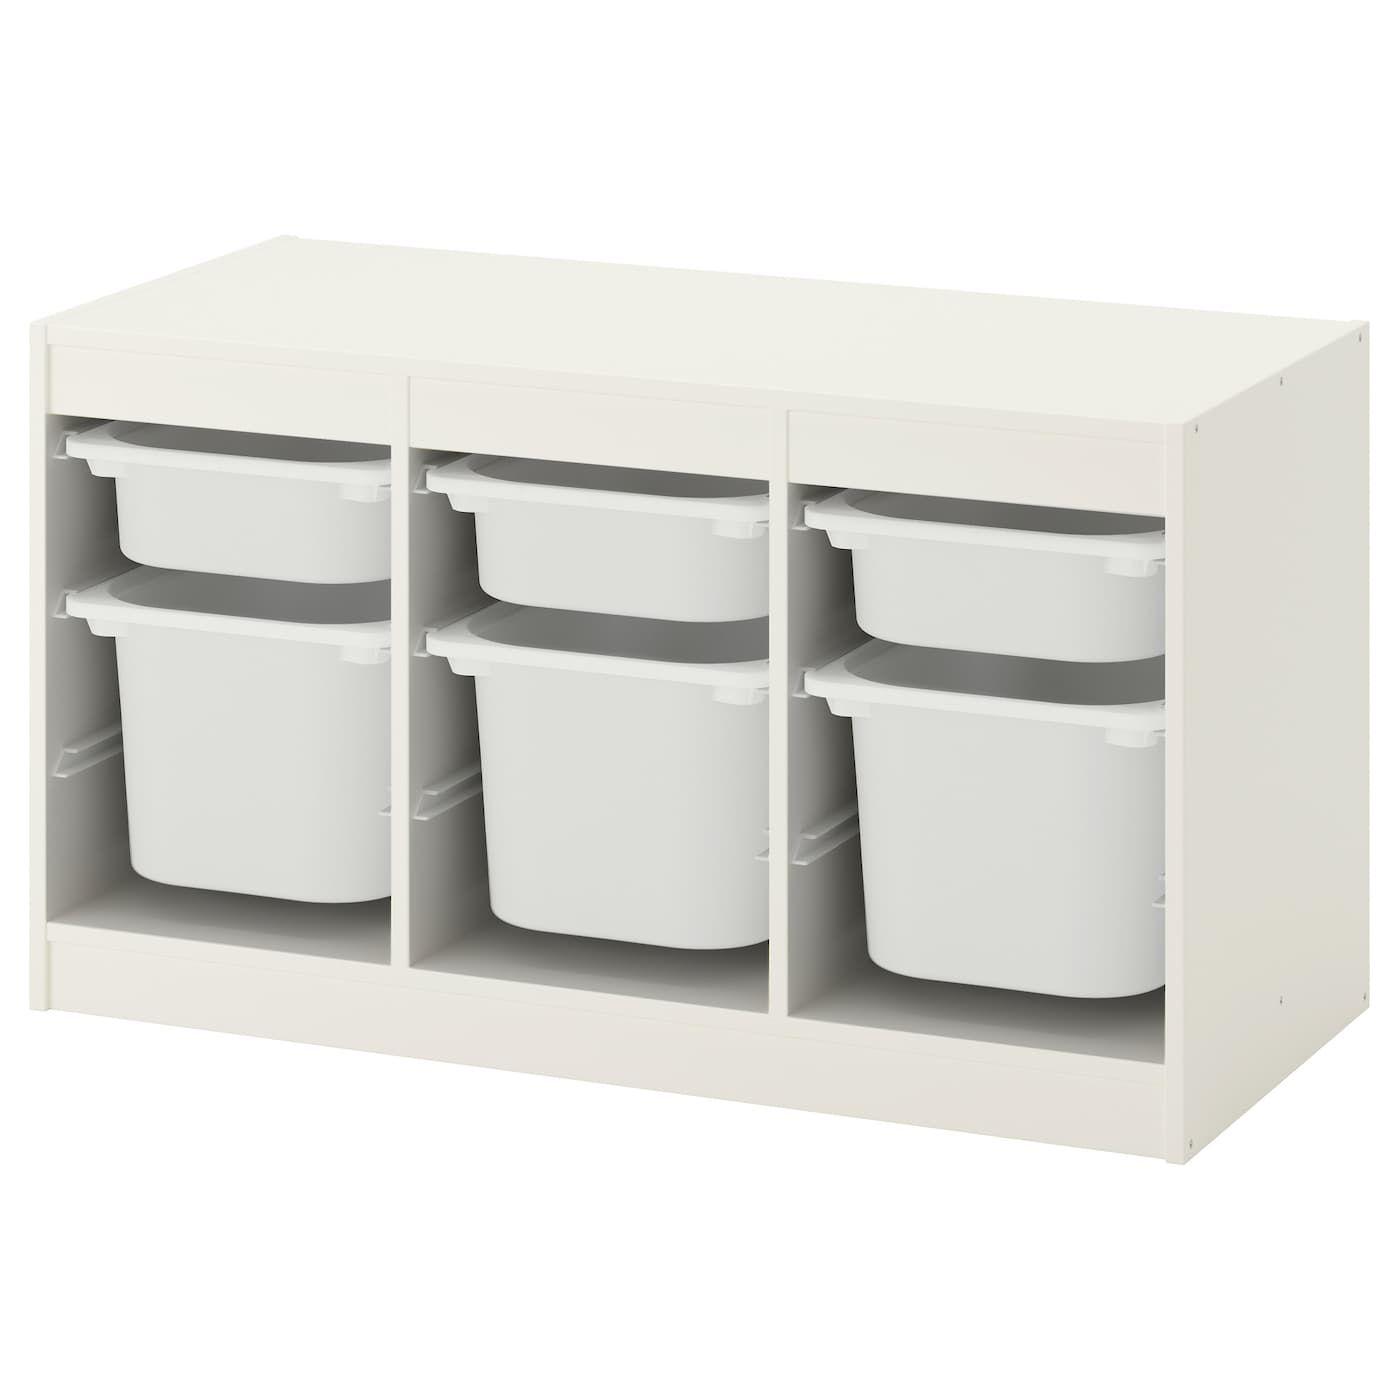 Ikea Trofast Rangement Boites Blanc Blanc En 2020 Rangement Bas Rangement Et Ikea